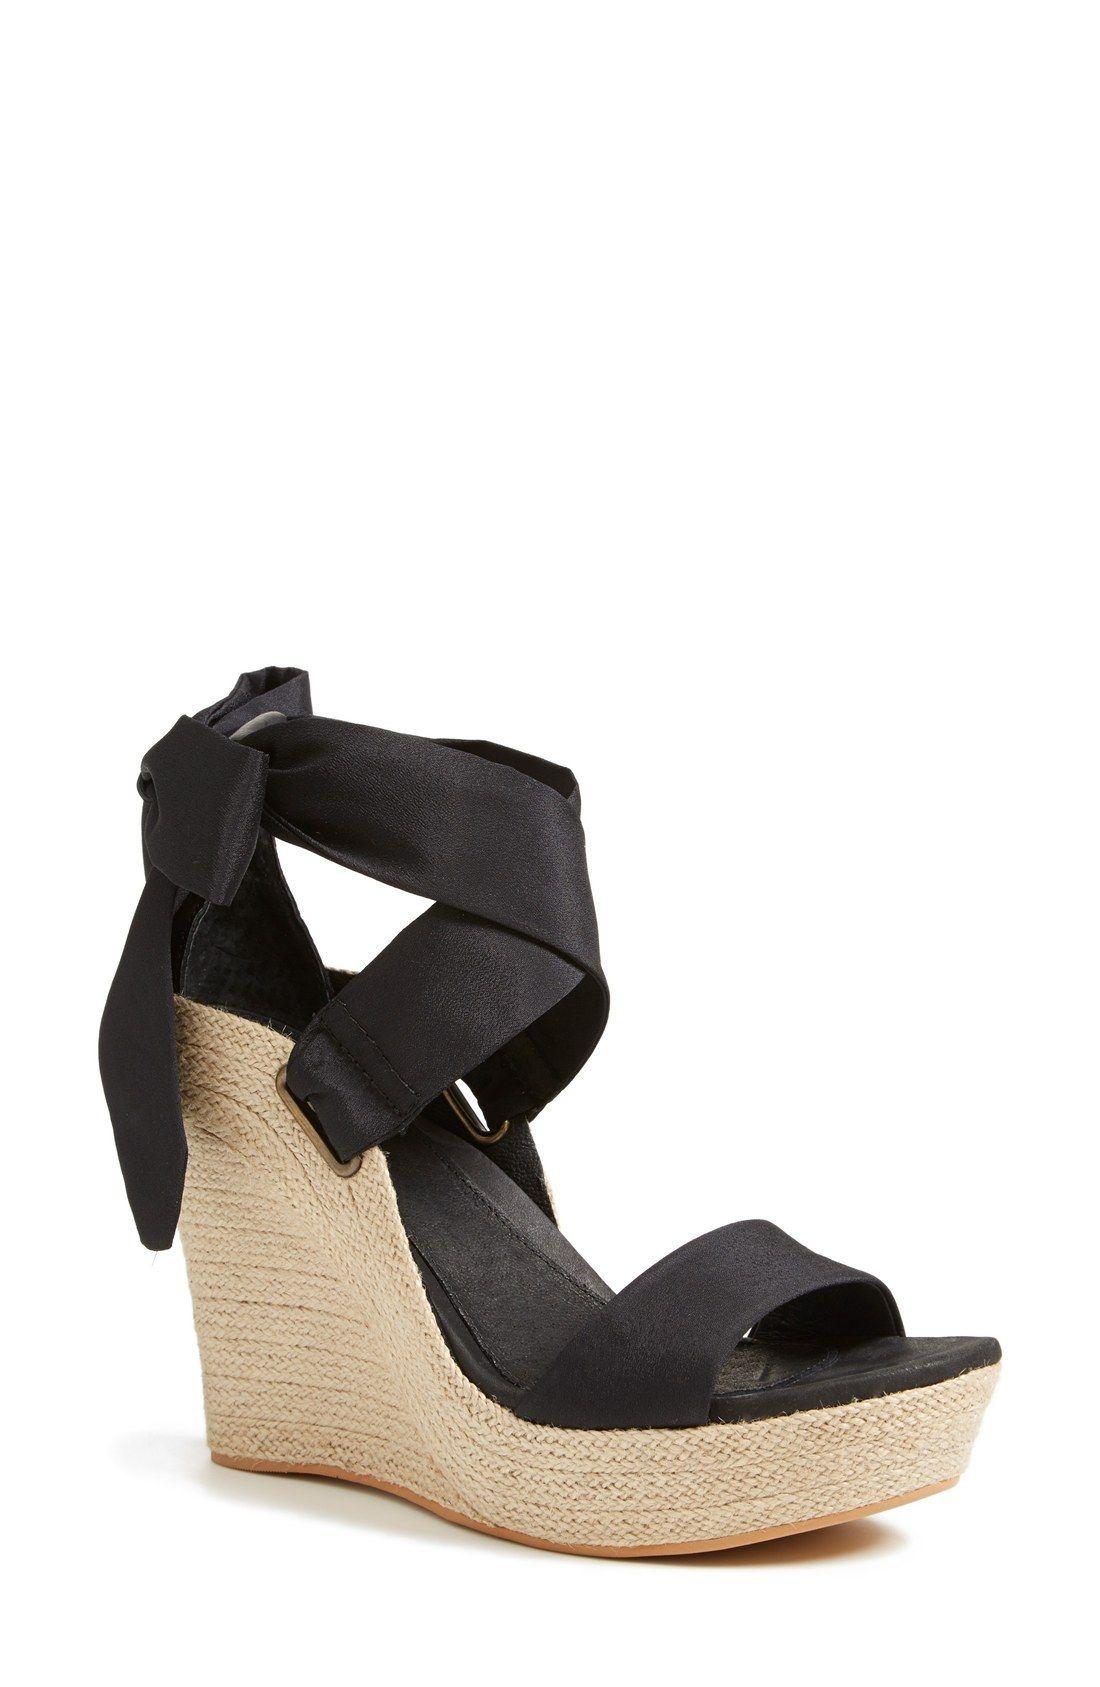 299b32b0047 UGG Jules Platform Wedge.  nordstrom  shoes  fashion